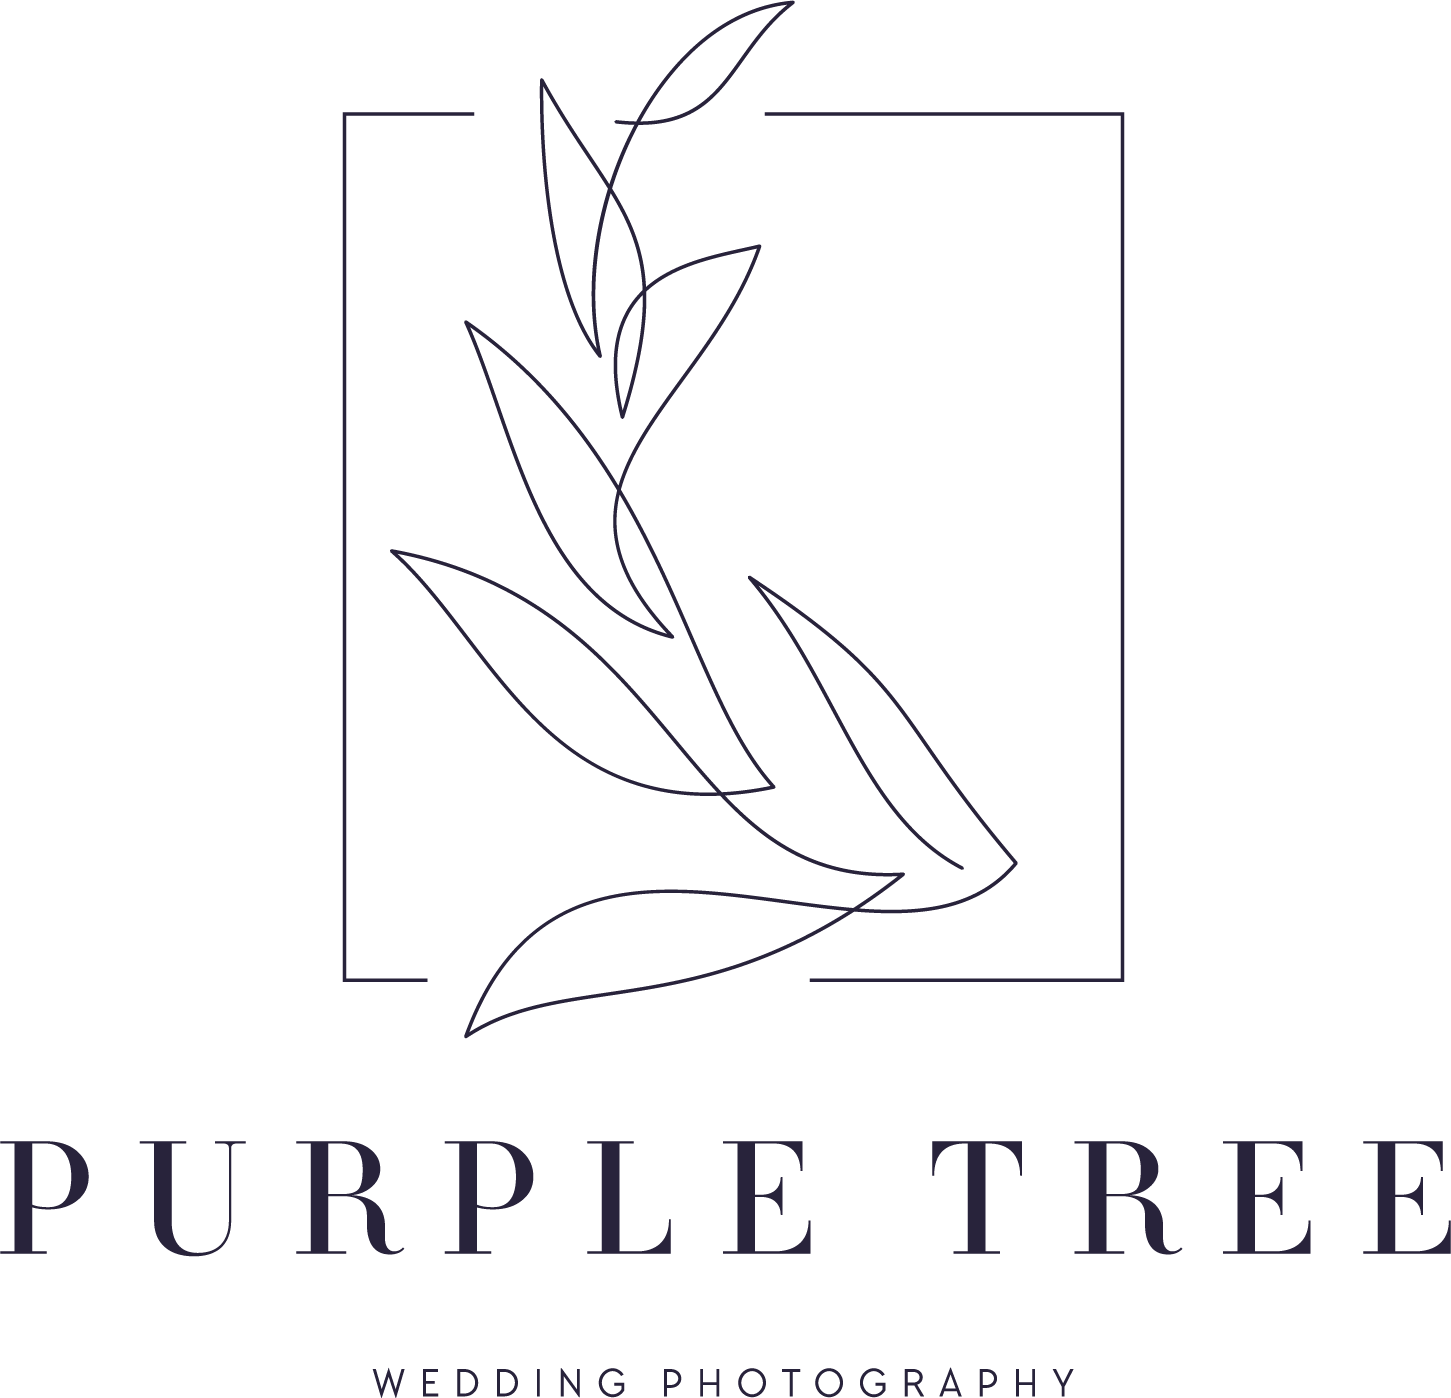 purpletree logo